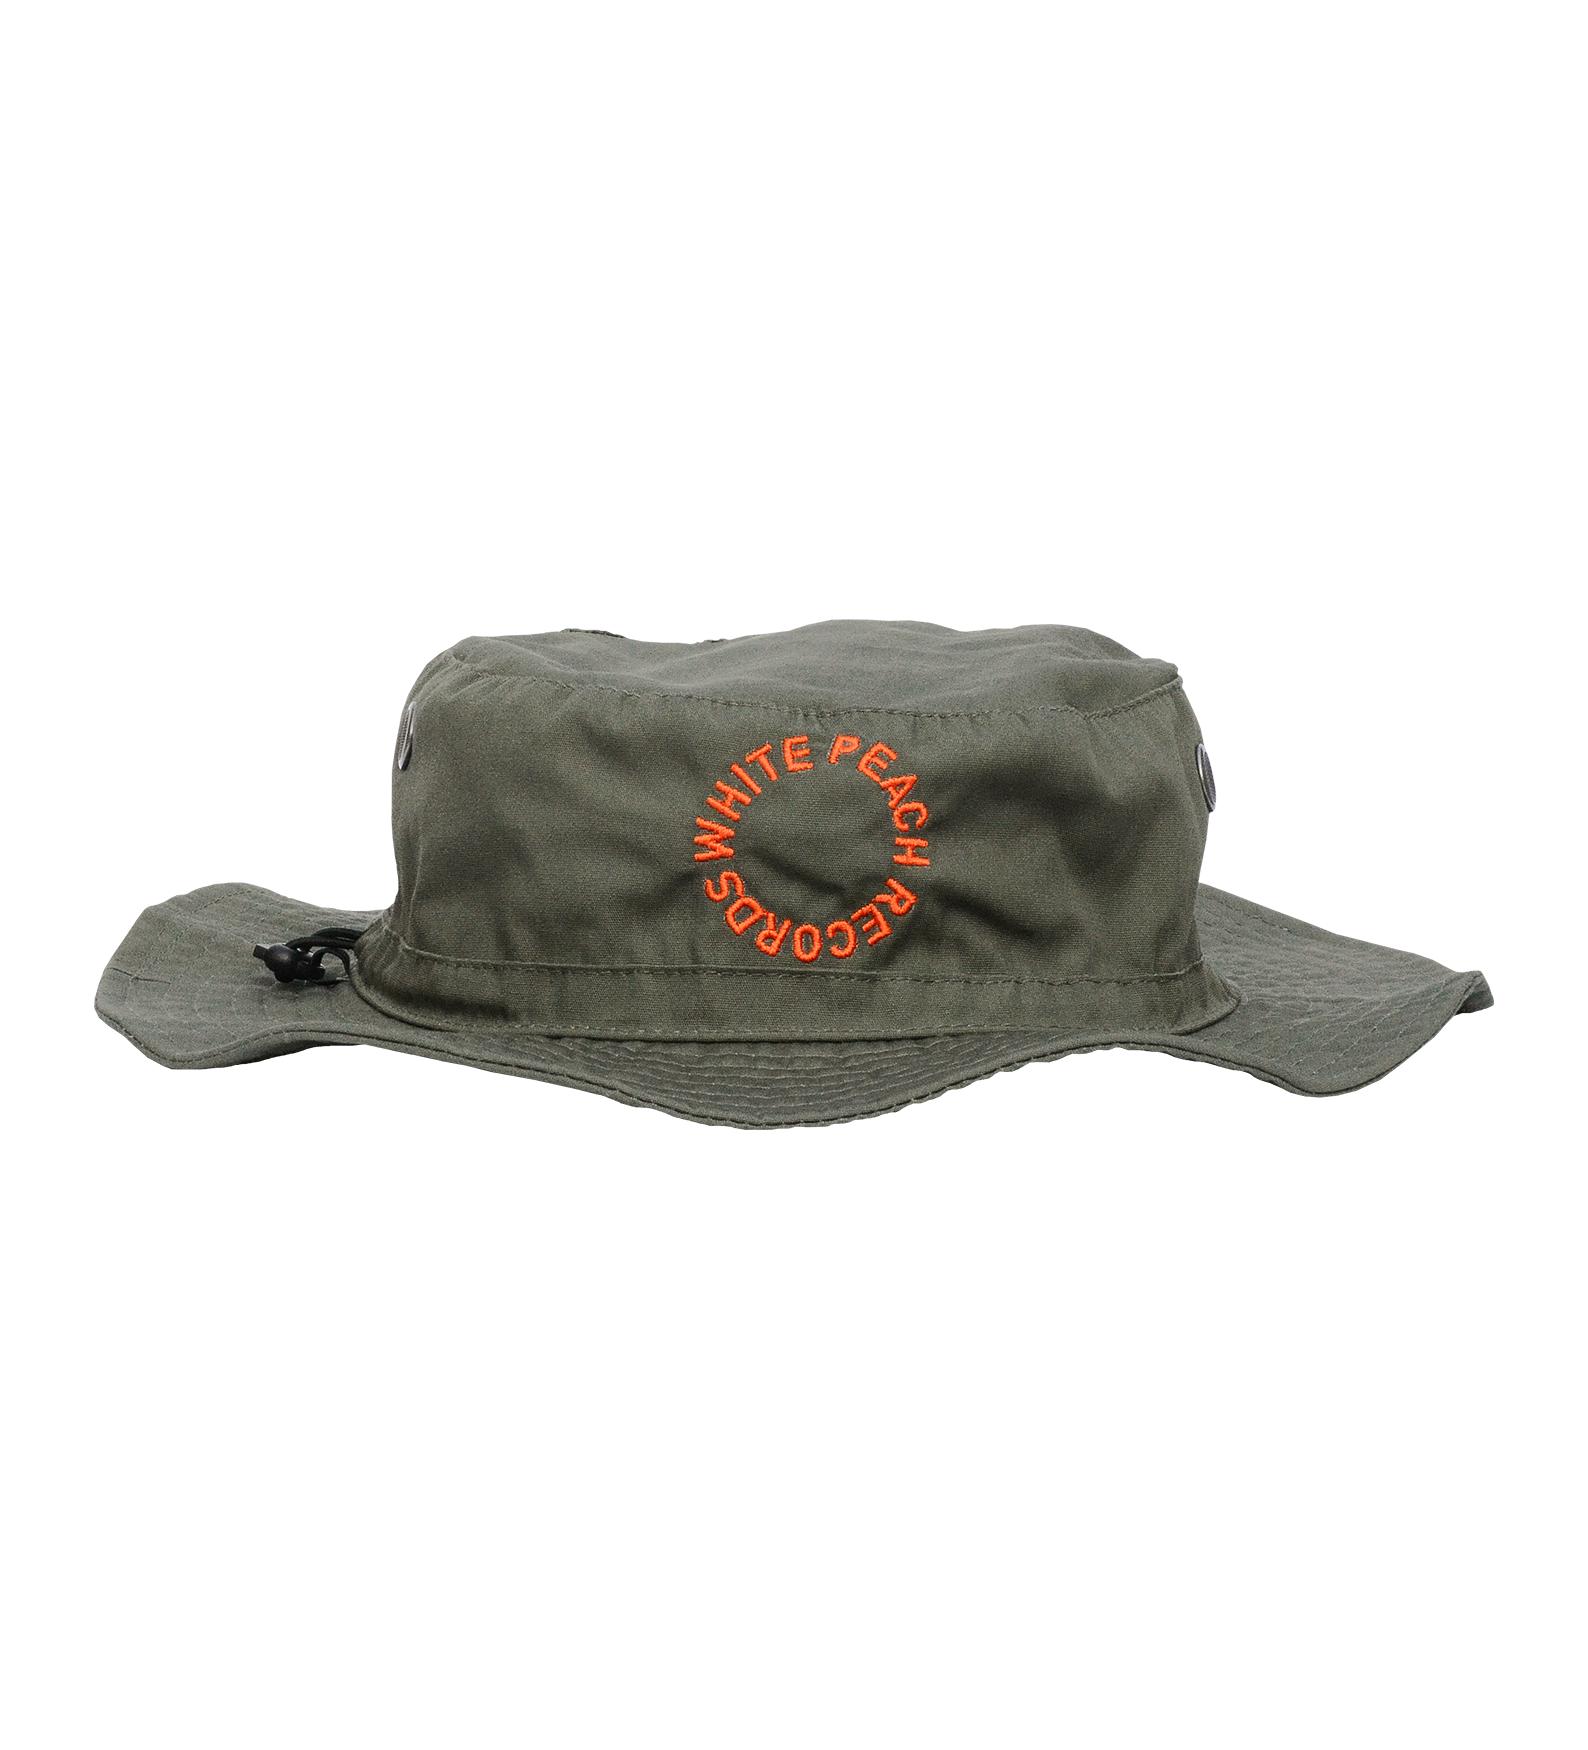 Wpt014 Green Bucket Hat W Orange Embroidery White Peach Records